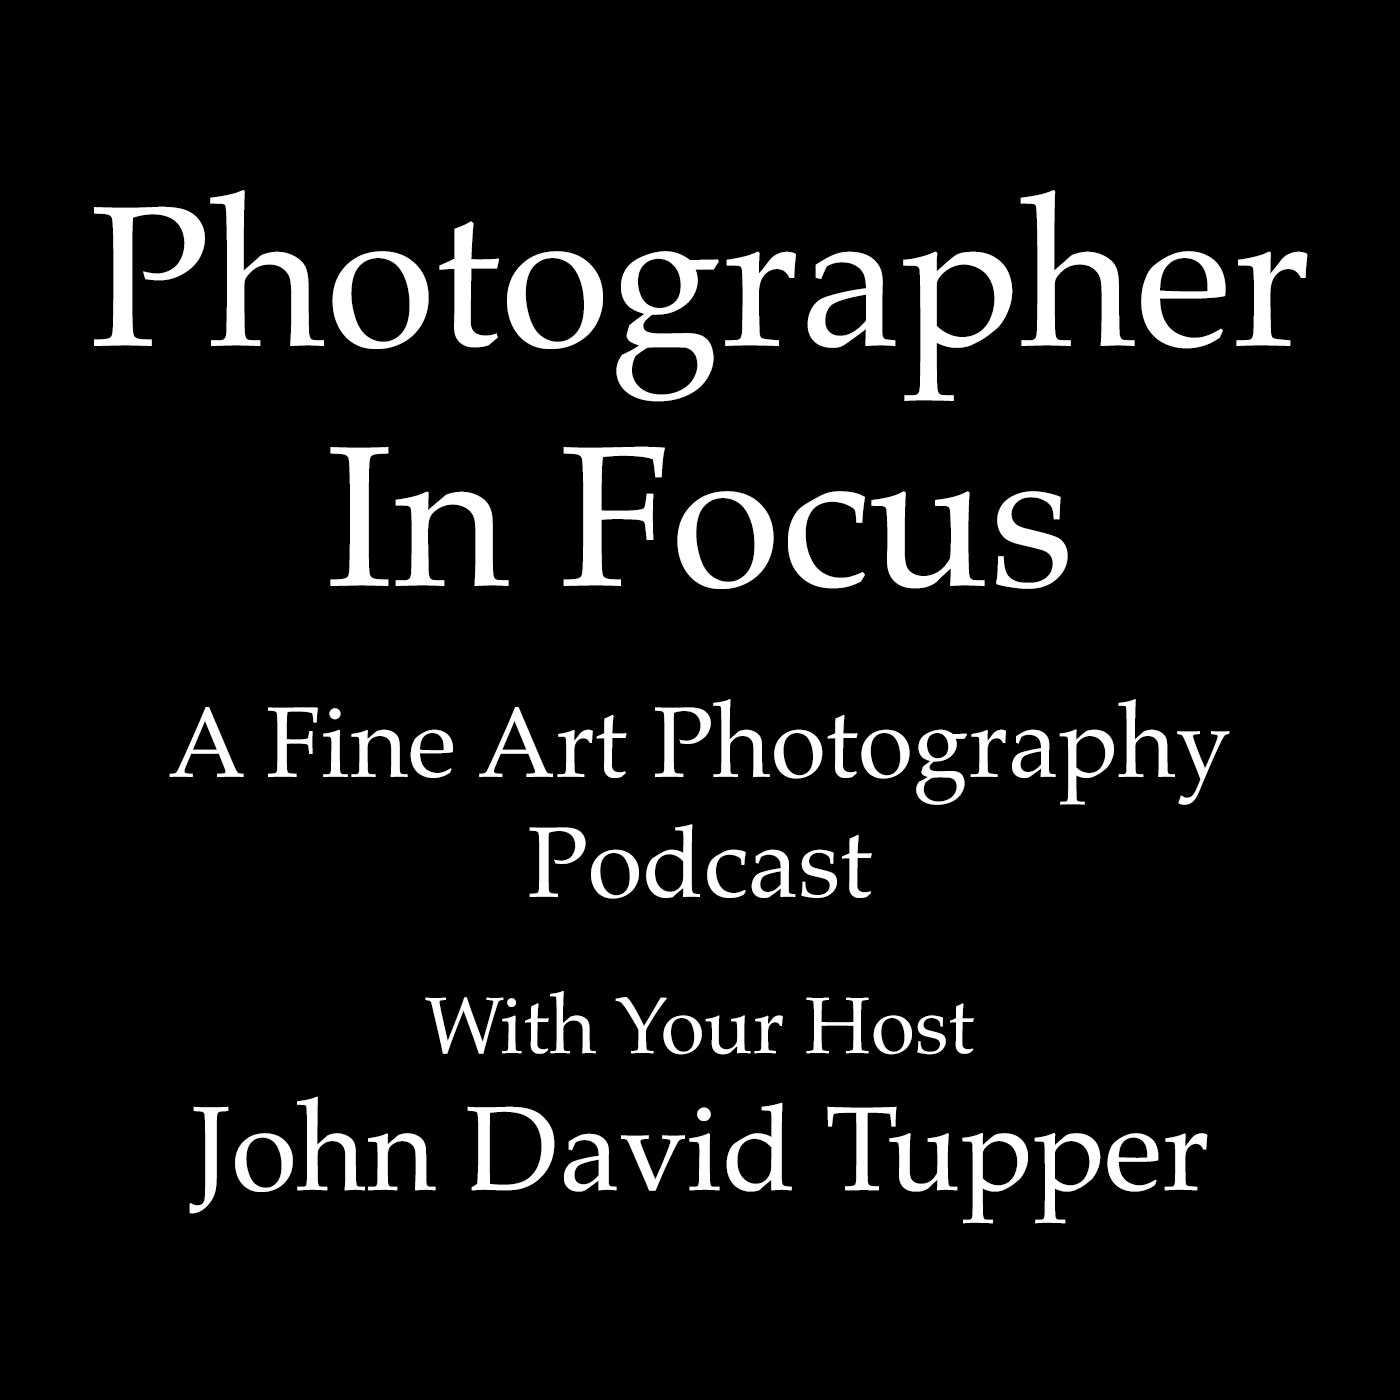 001 Scott London | Photographer In Focus With John David Tupper show art